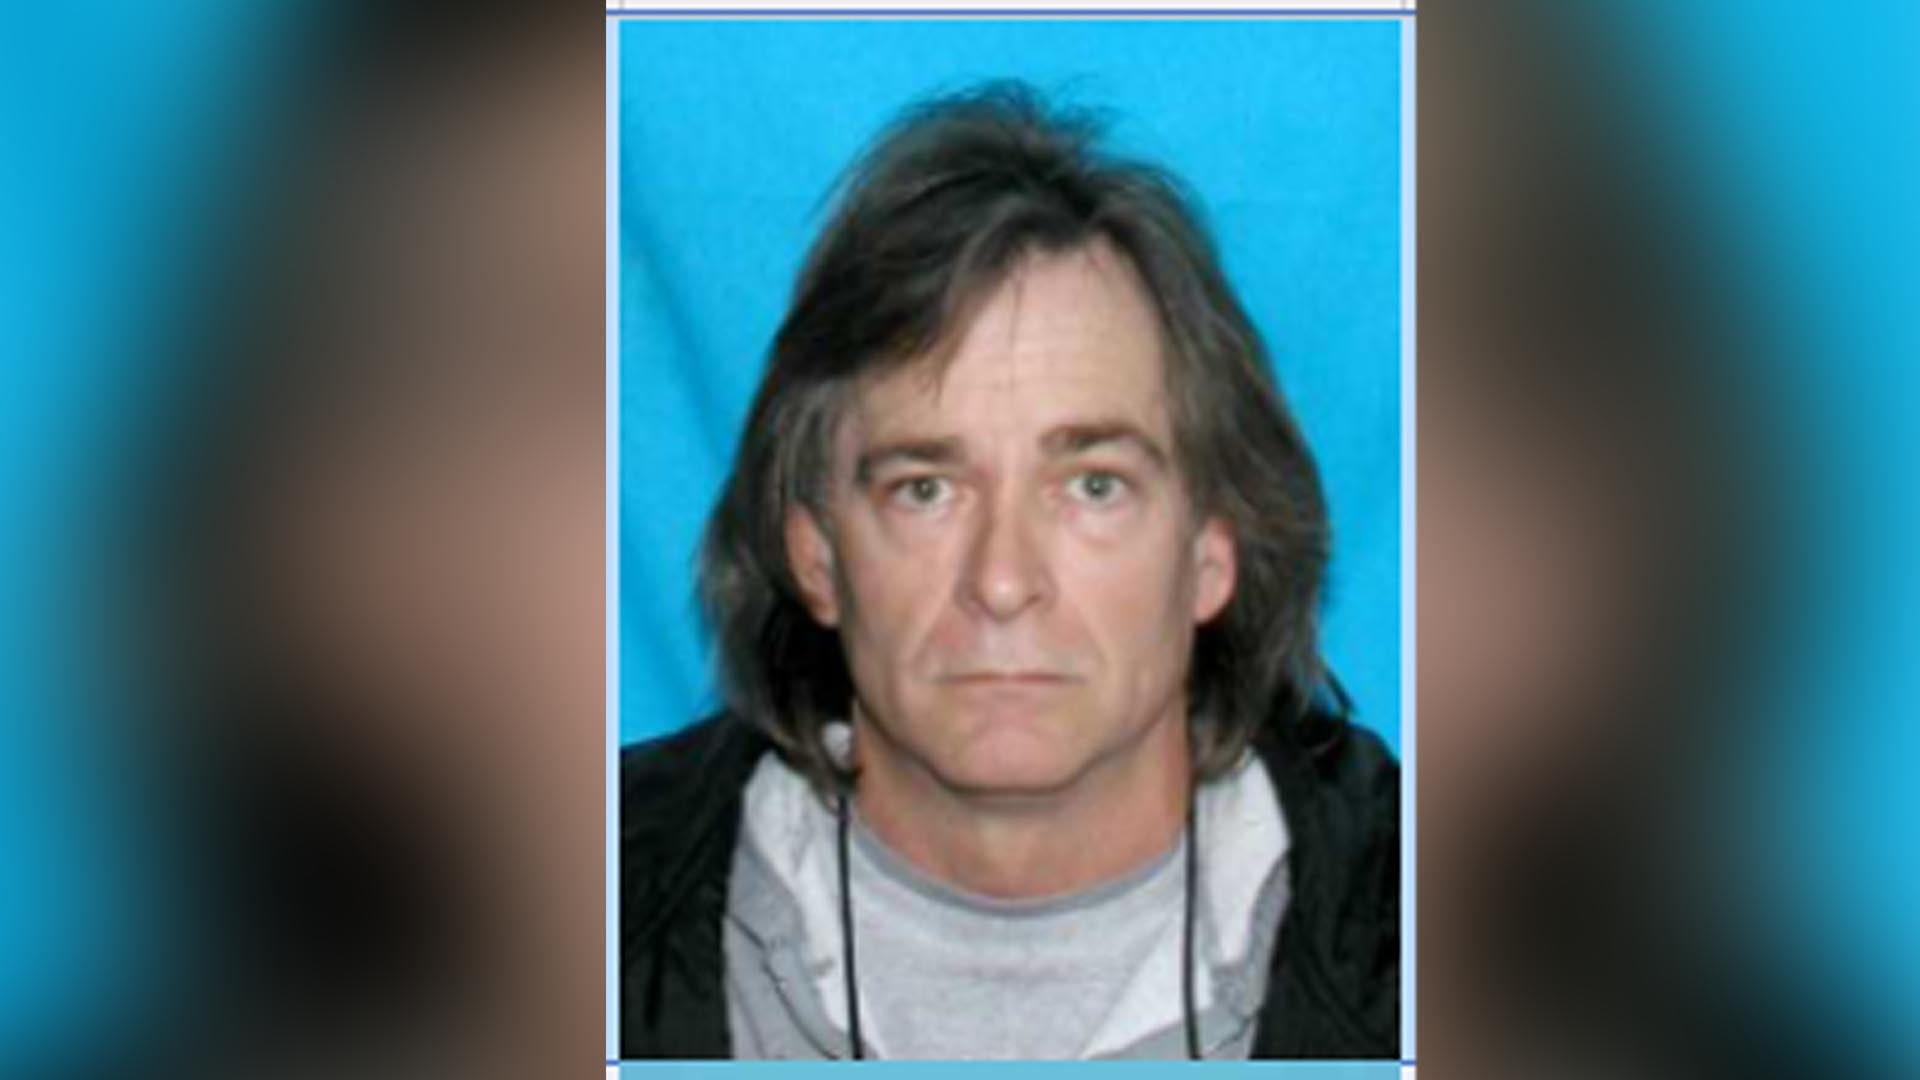 Investigators reportedly looking into whether Nashville bombing suspect believed in alien lizards